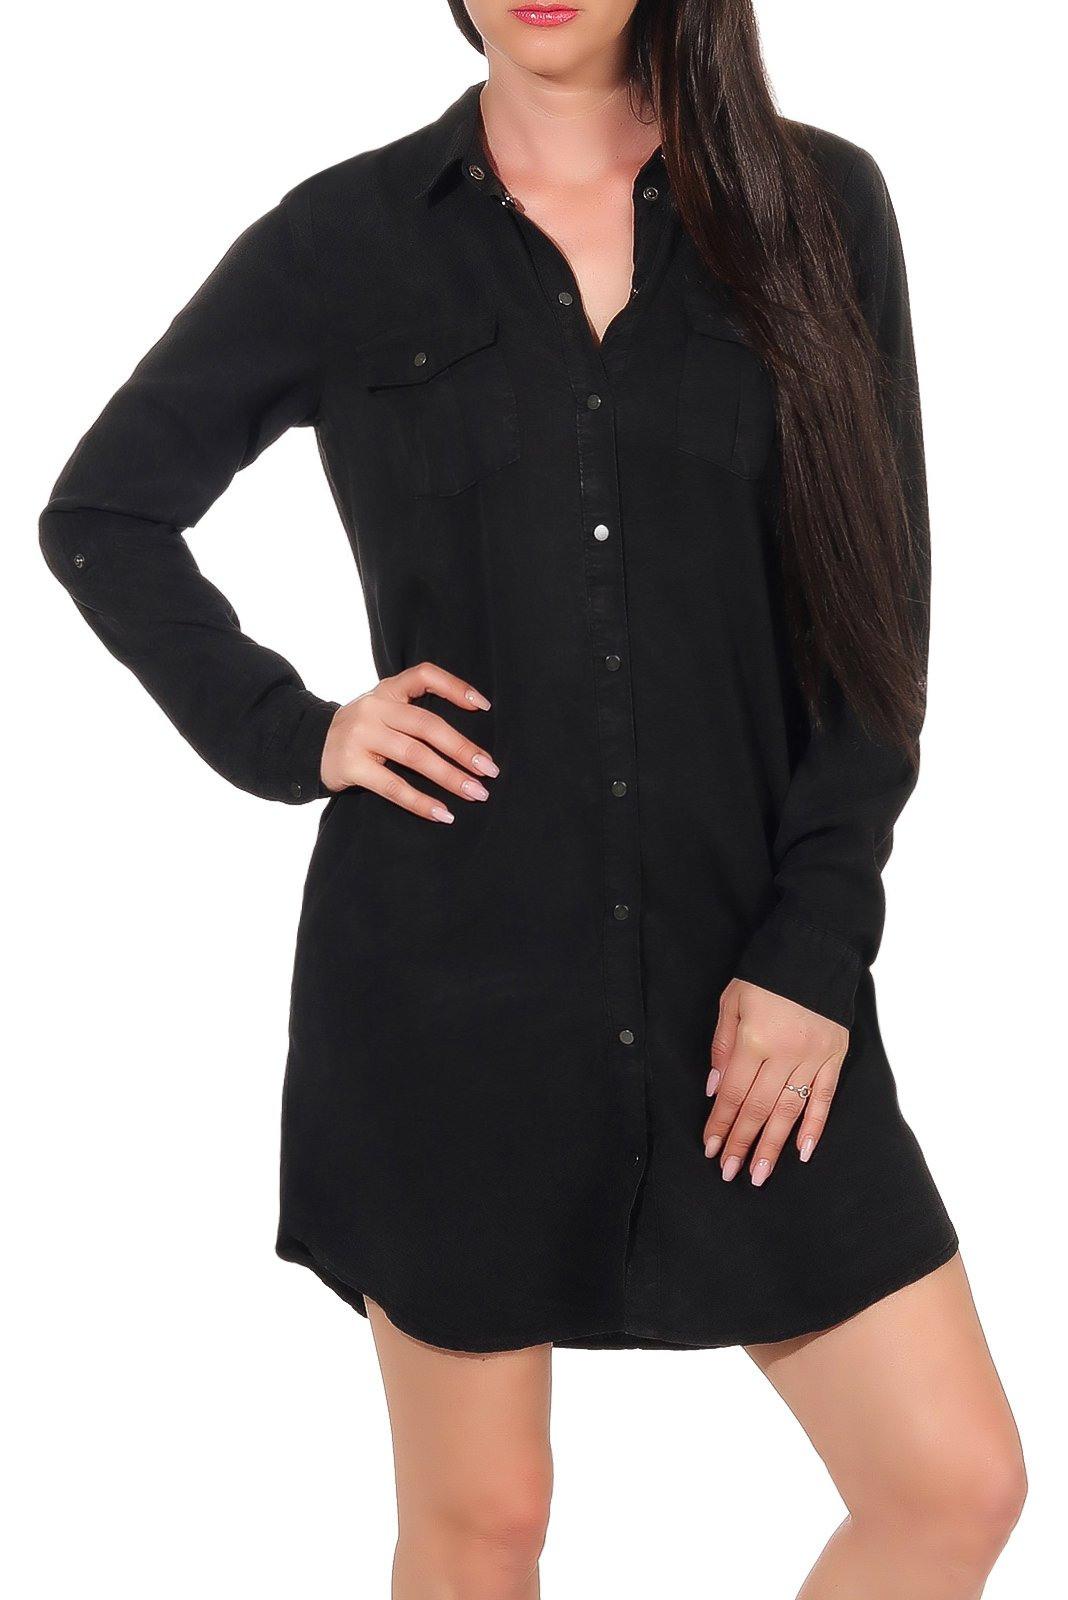 Vero Moda Damen Shirtkleid Silla Langarm  Röcke/ Kleider